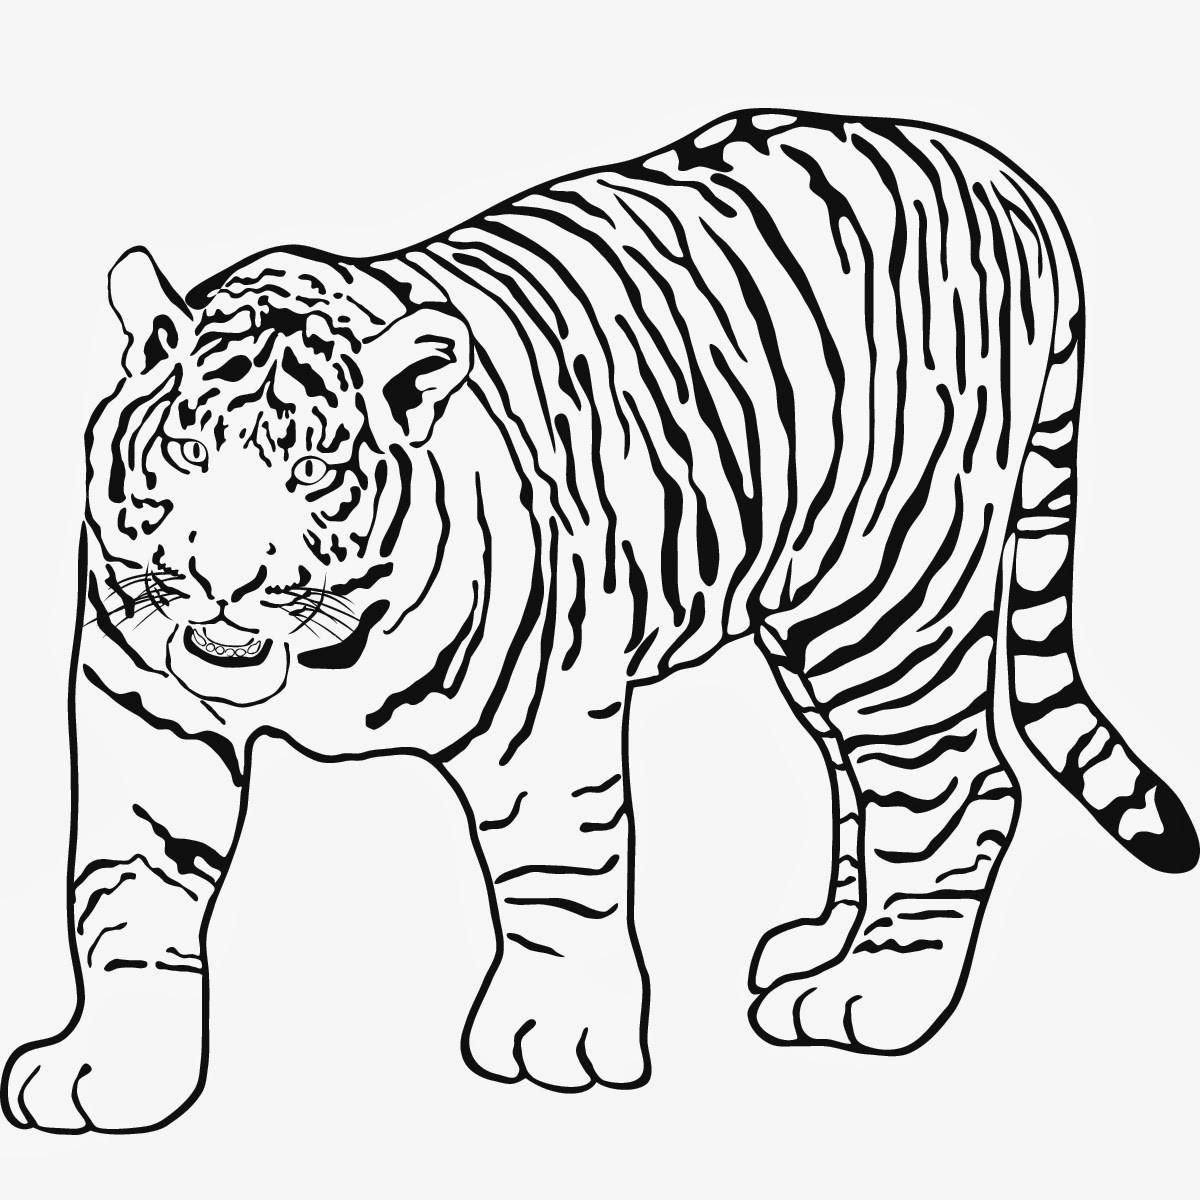 20 Ideen Für Tiger Ausmalbilder Beste Wohnkultur Bastelideen